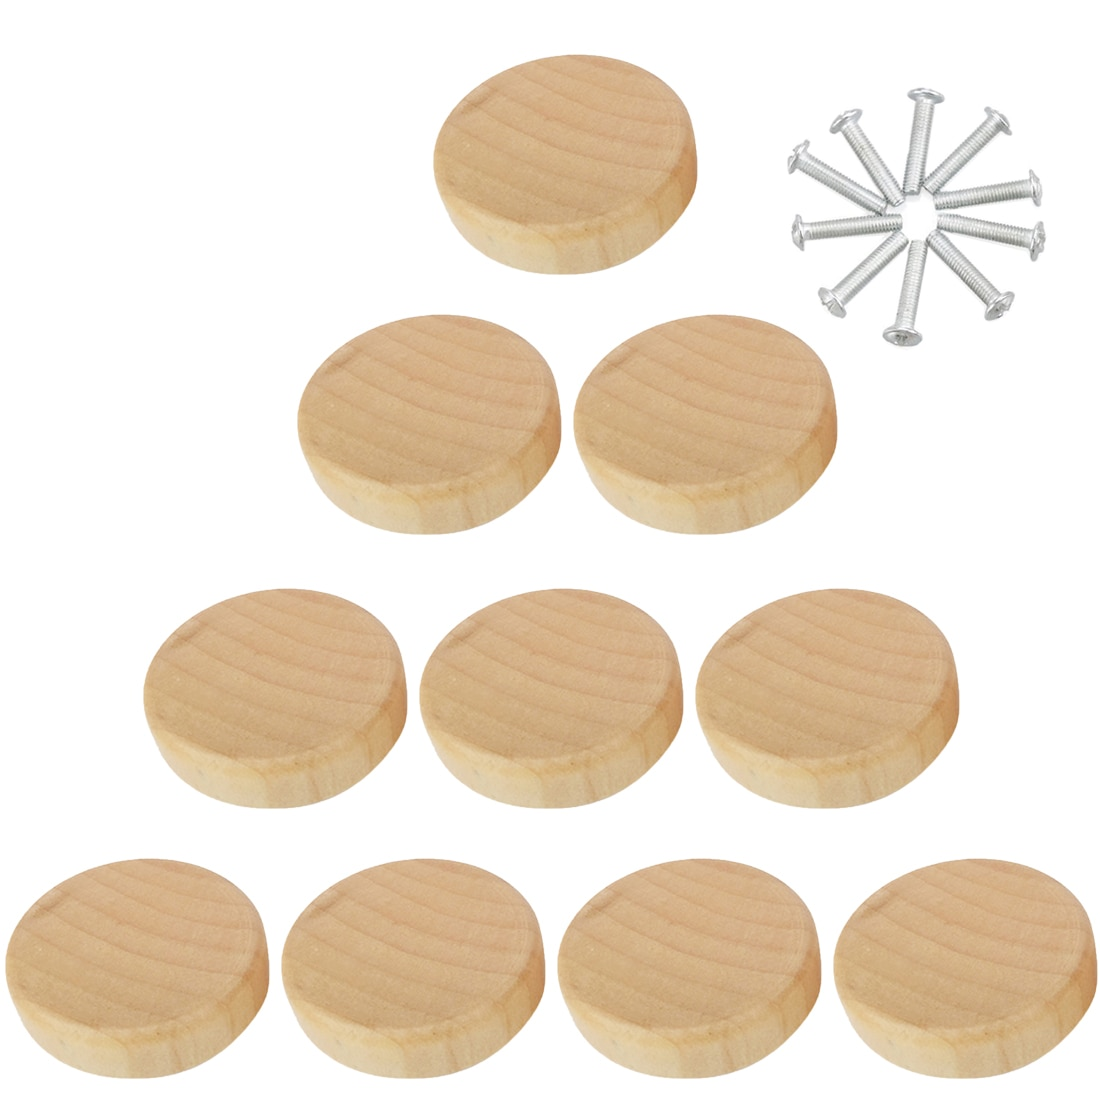 8pcs /10pcs /20pcs /50pcs Solid Wood Single Hole Handle Drawer Cabinet Door Wooden Pull Handle Furniture Handle Knob Hardware